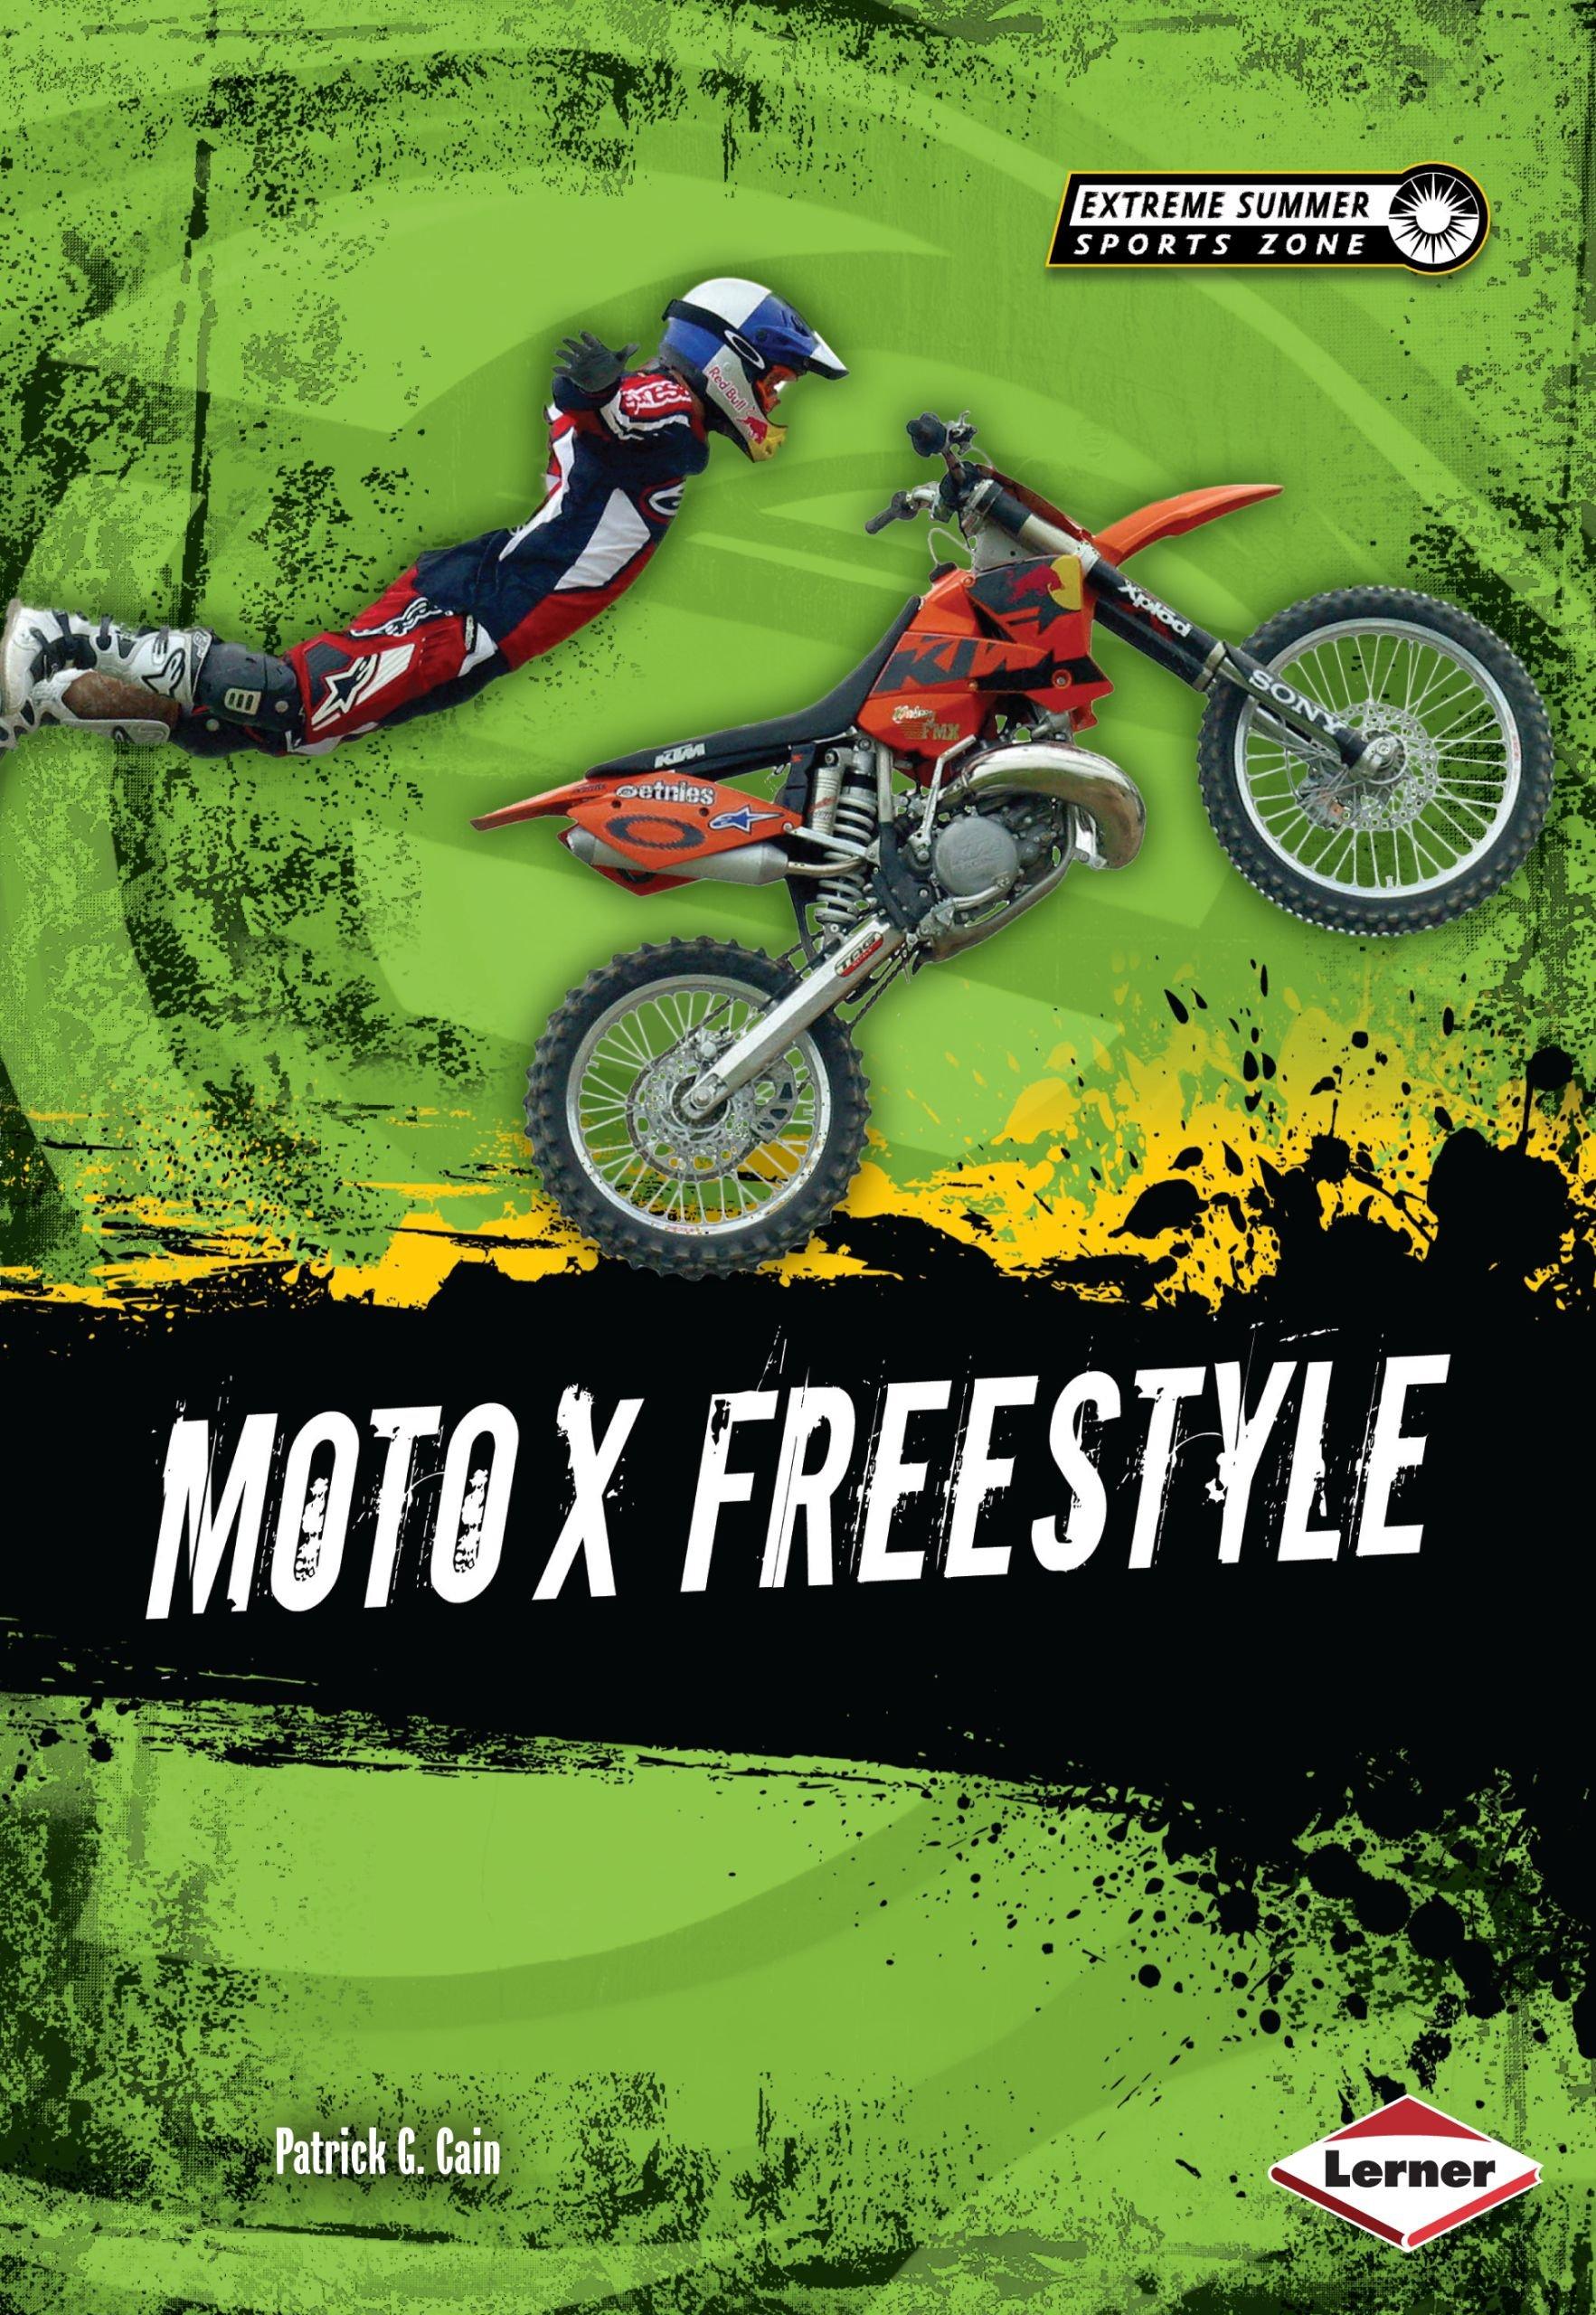 Moto X Freestyle (Extreme Summer Sports Zone)